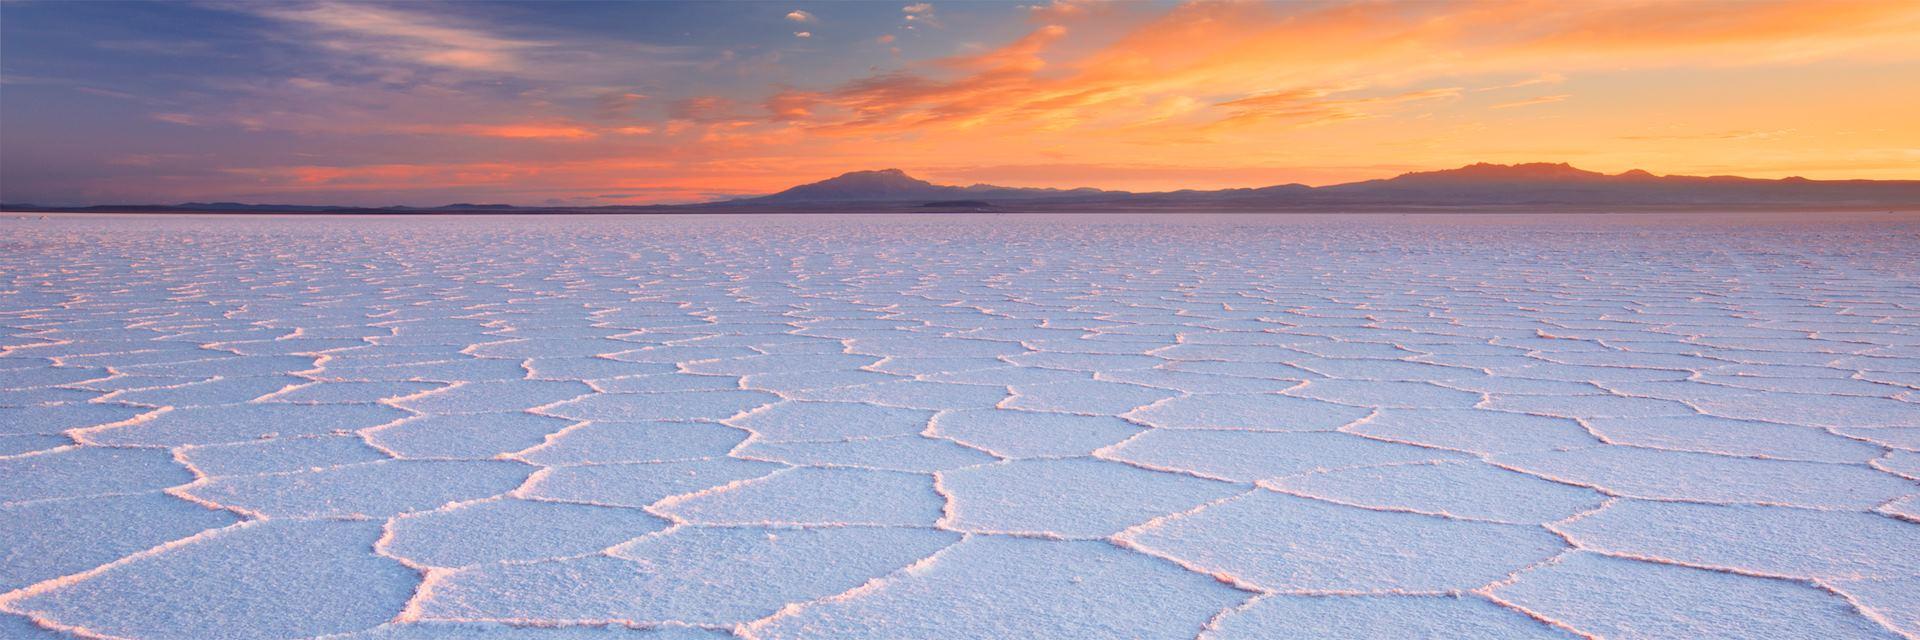 Salar de Uyuni, Southern Altiplano